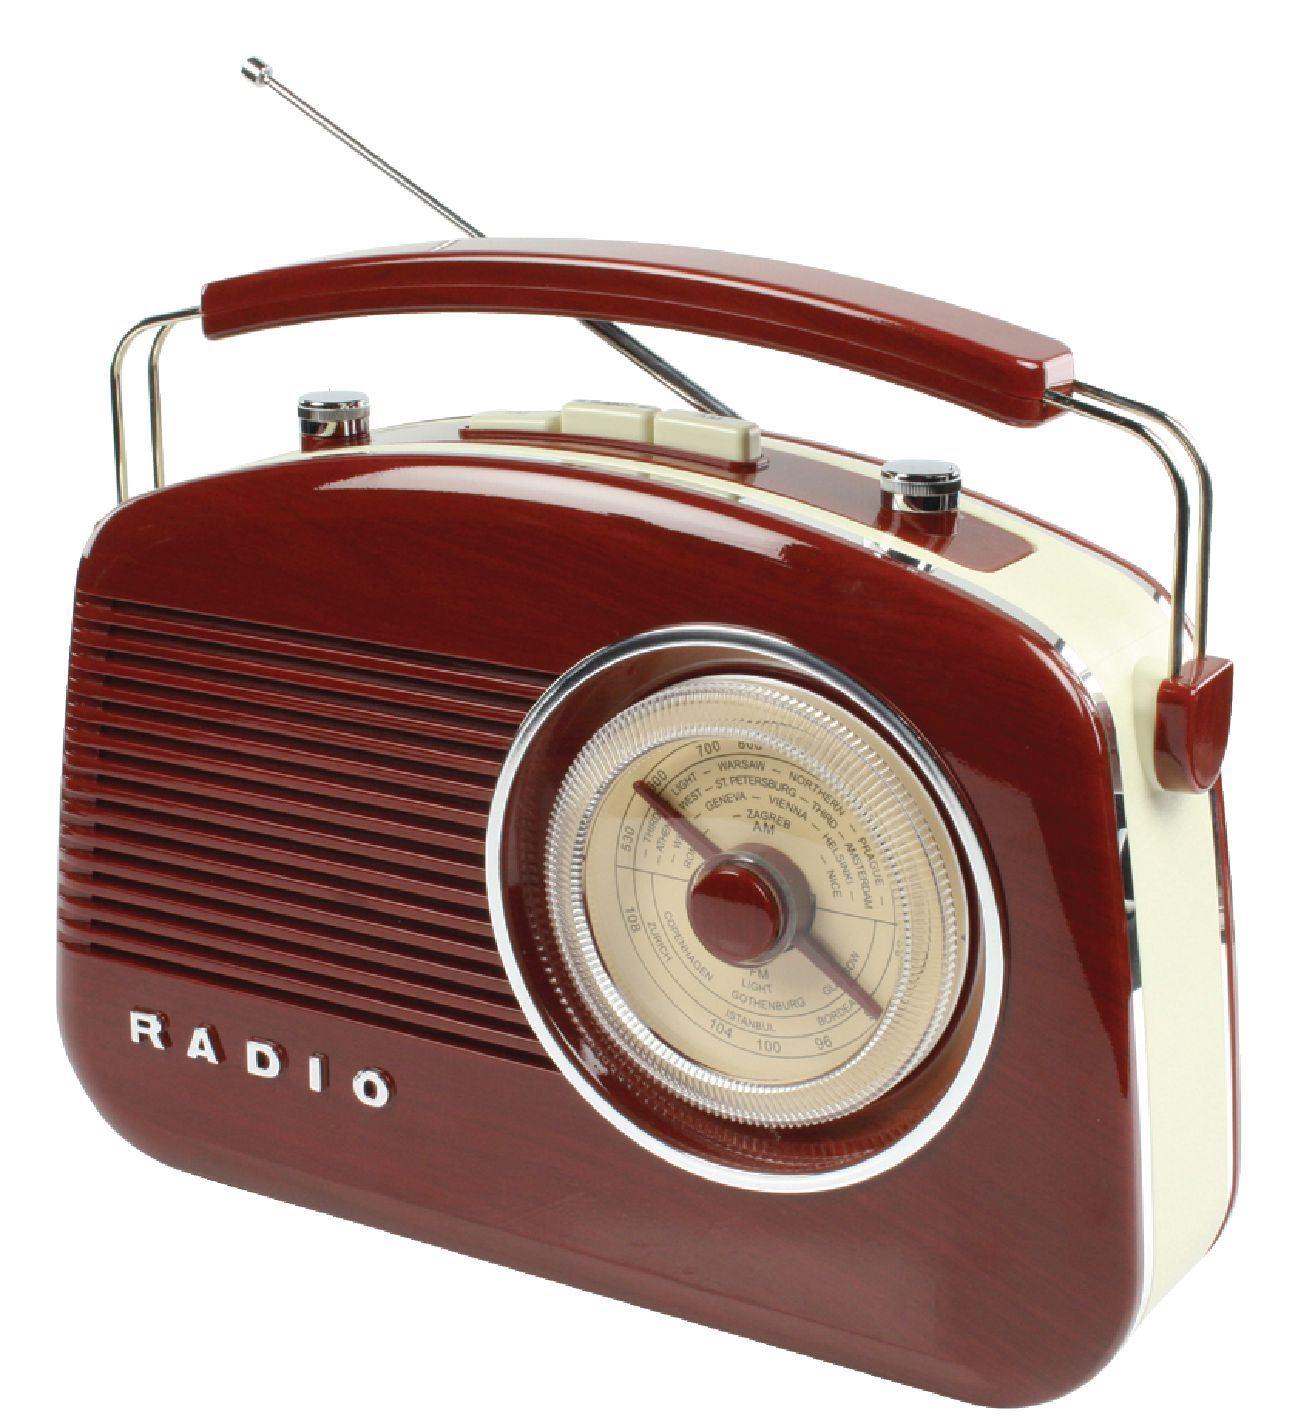 Konig Retro 50s/60s Design AM/FM Radio (Brown) For Living